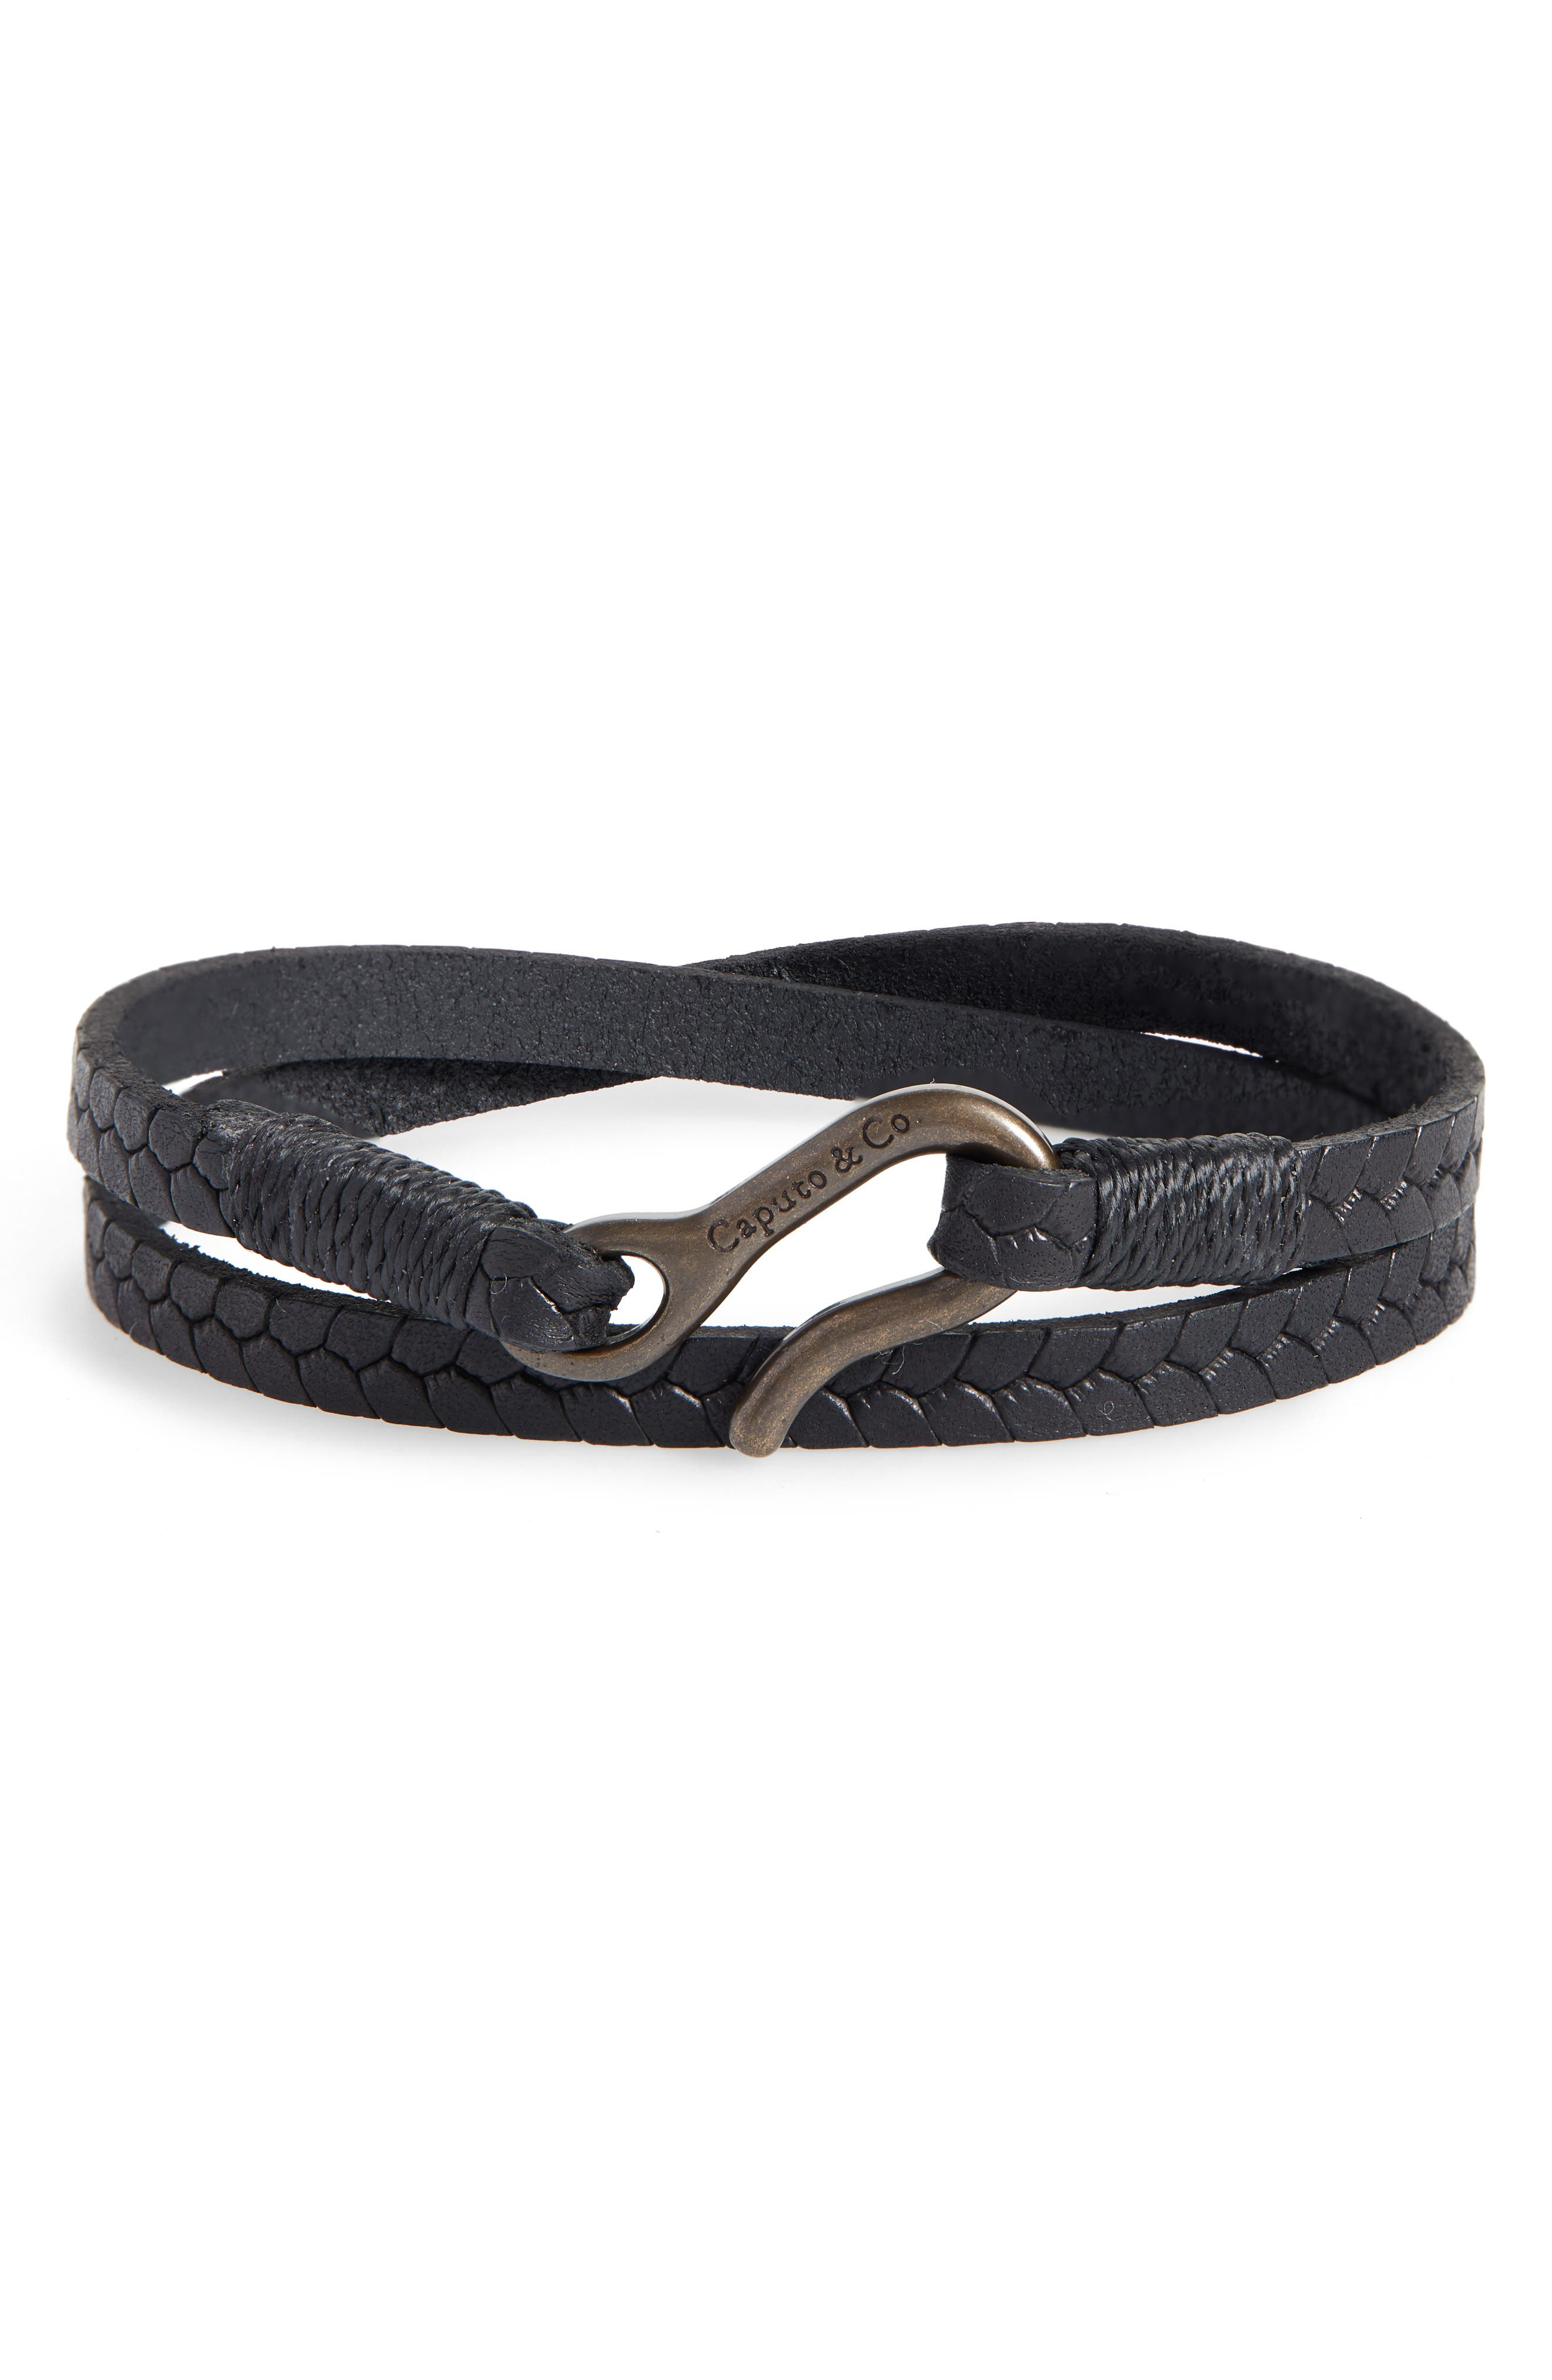 CAPUTO & CO. Embossed Leather Wrap Bracelet in Black